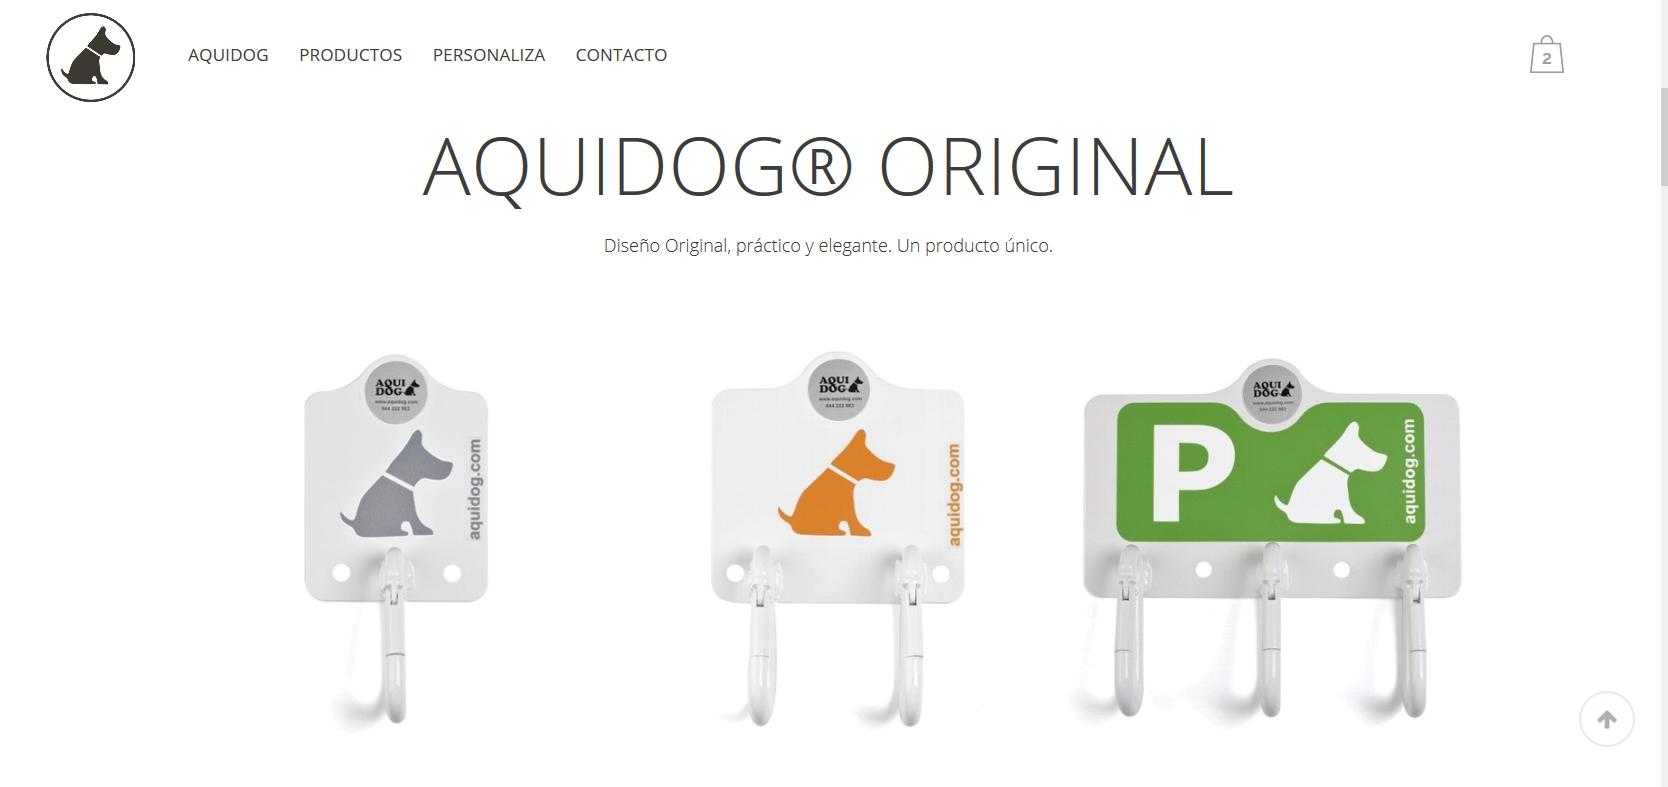 2016-11-13-17_01_21-aquidog-productos-originales